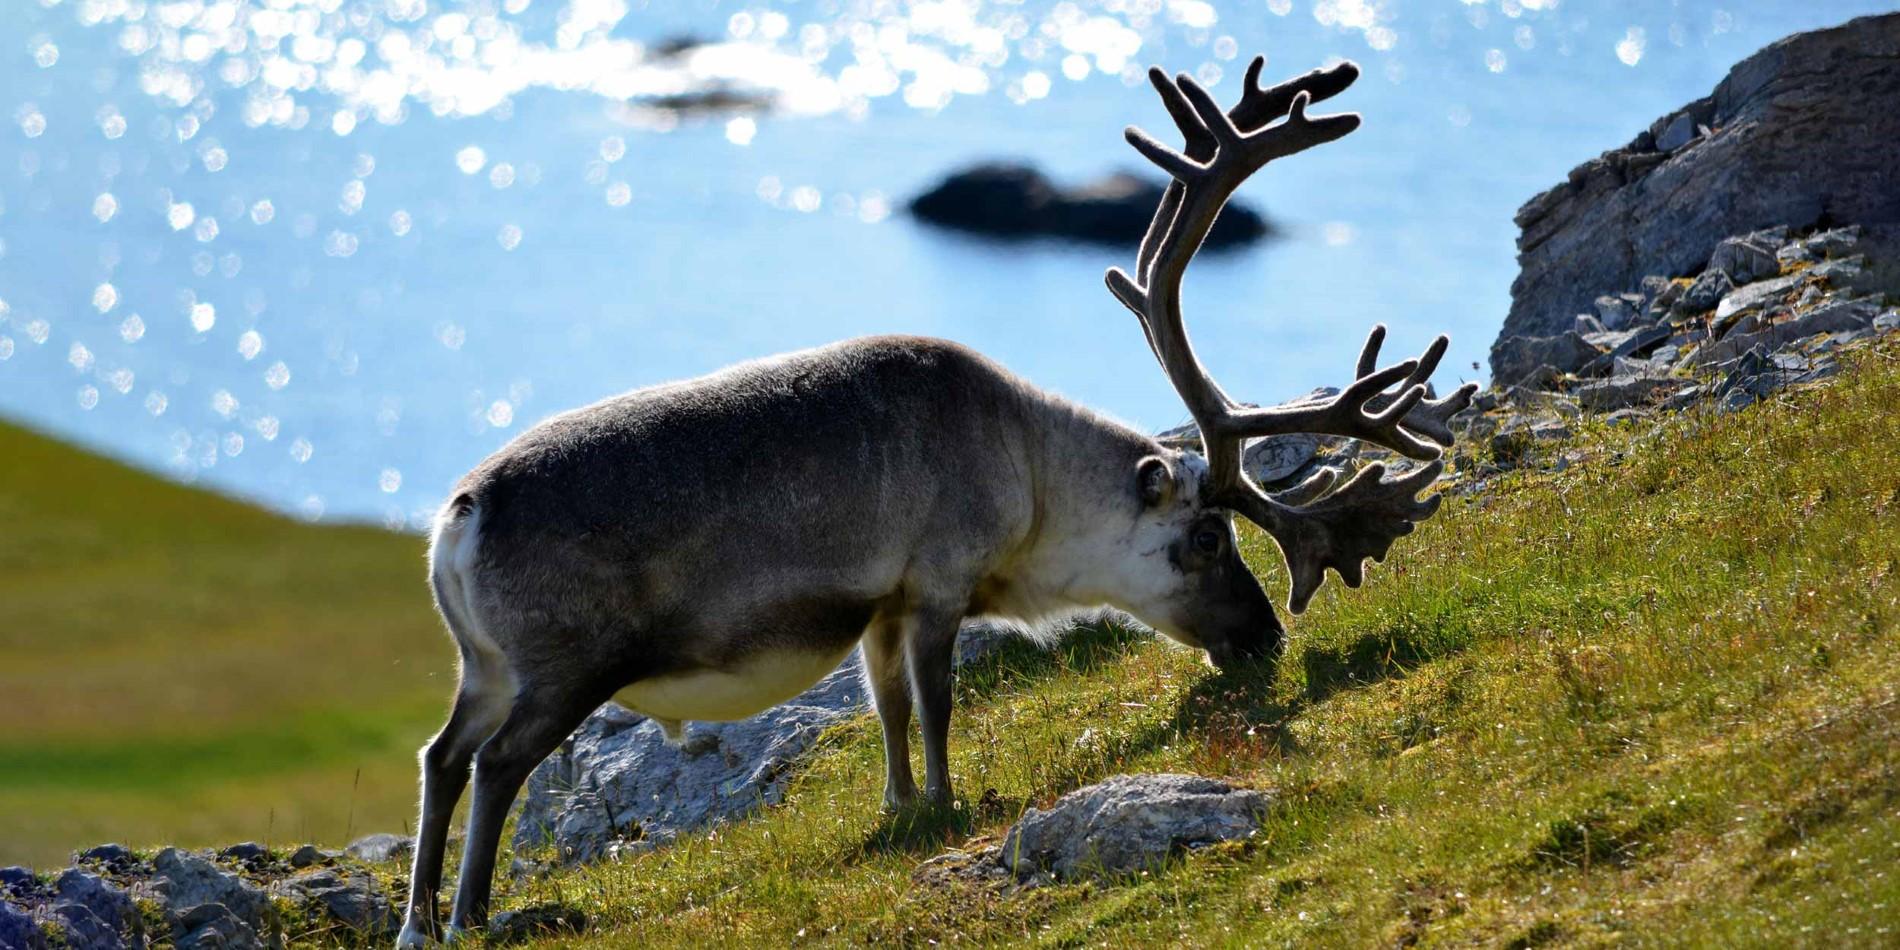 https://www.hurtigruten.fr/globalassets/photos/destinations/svalbard/wildlife/heike-konrad-reindeer.jpg?width=1900&height=950&center=0.56,0.5&transform=DownResizeCrop